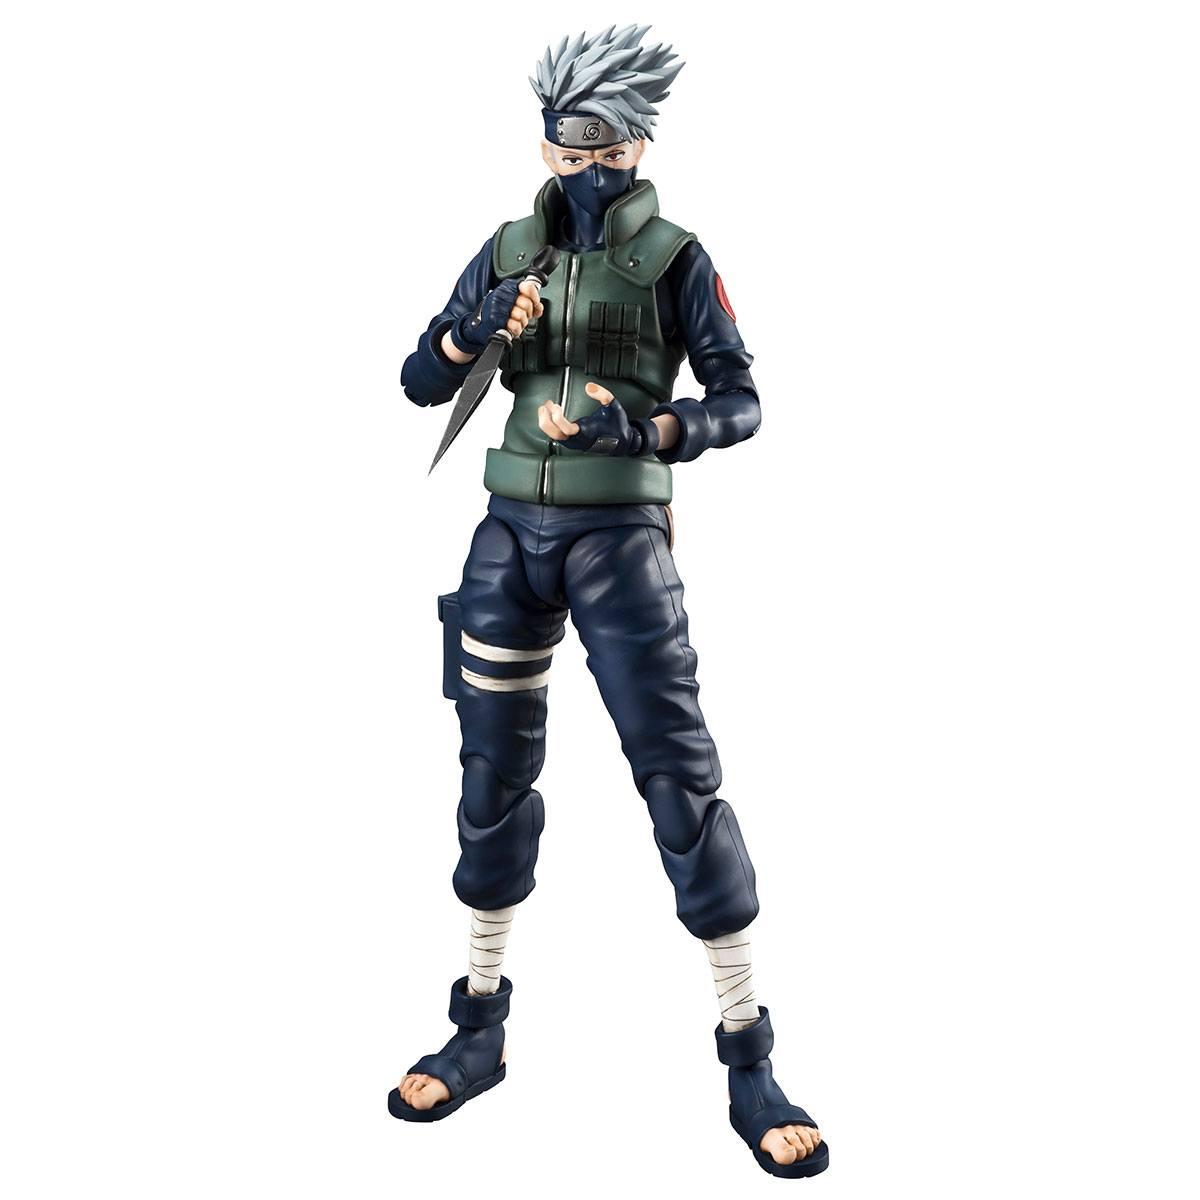 Naruto Variable Action Heroes DX Action Figure Hatake Kakashi 18 cm